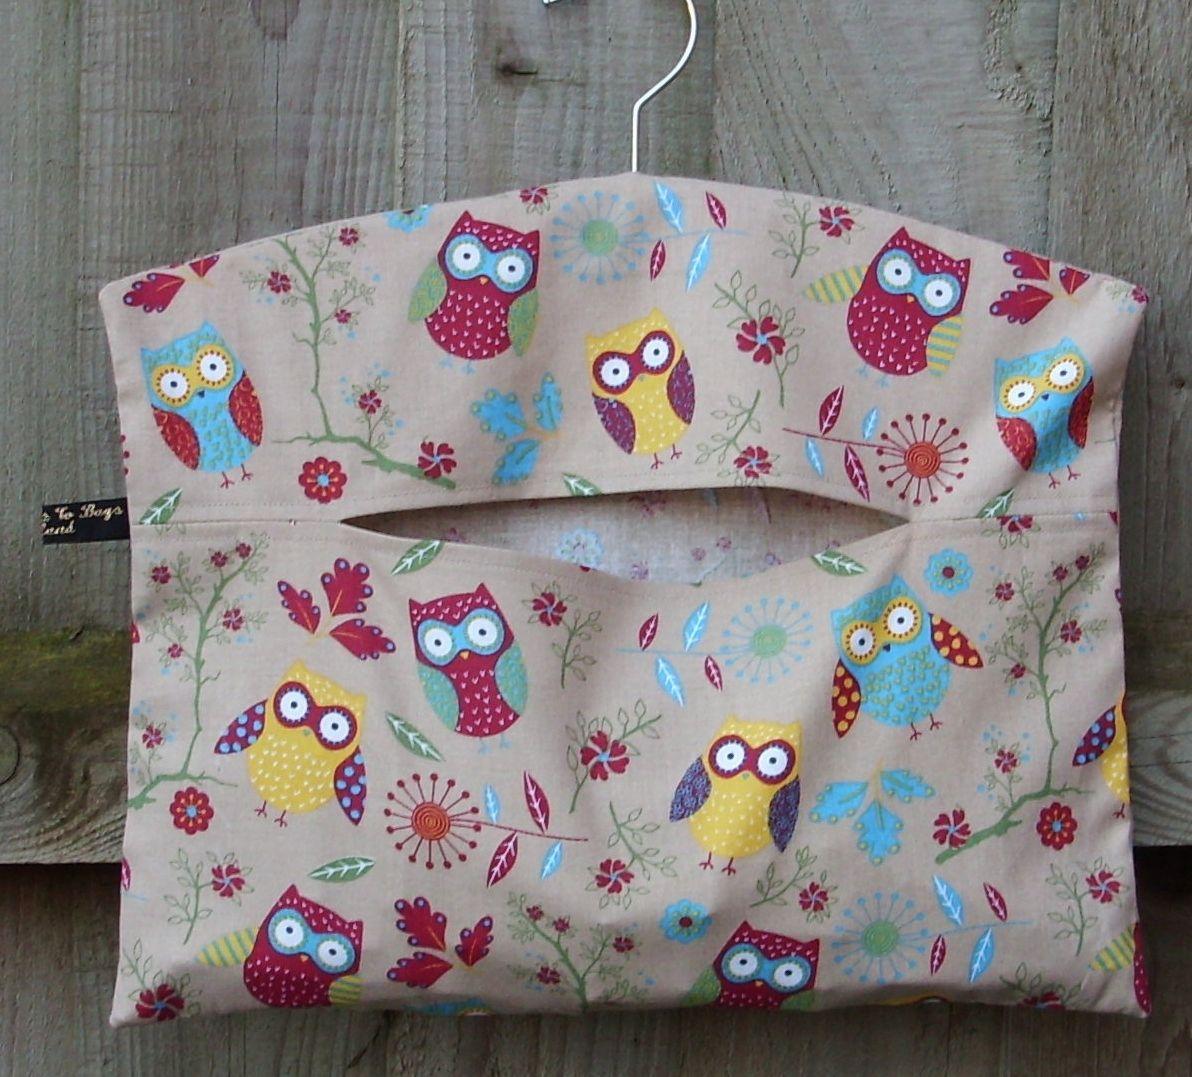 Retro owl clothes pin peg bag fromragstobags lowering